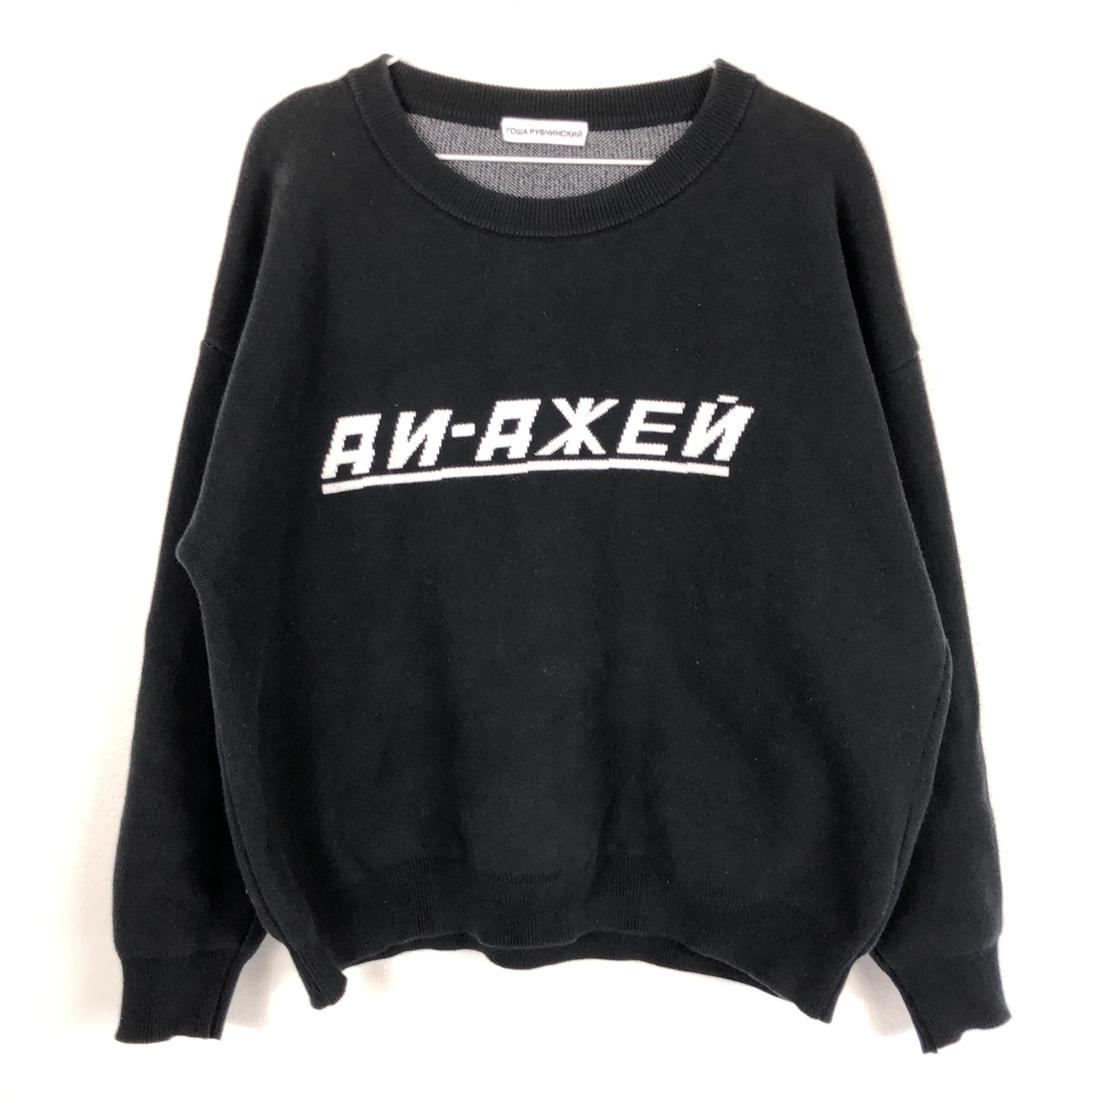 Gosha Rubchinskiy AN AXEN Dj knit black oversized.